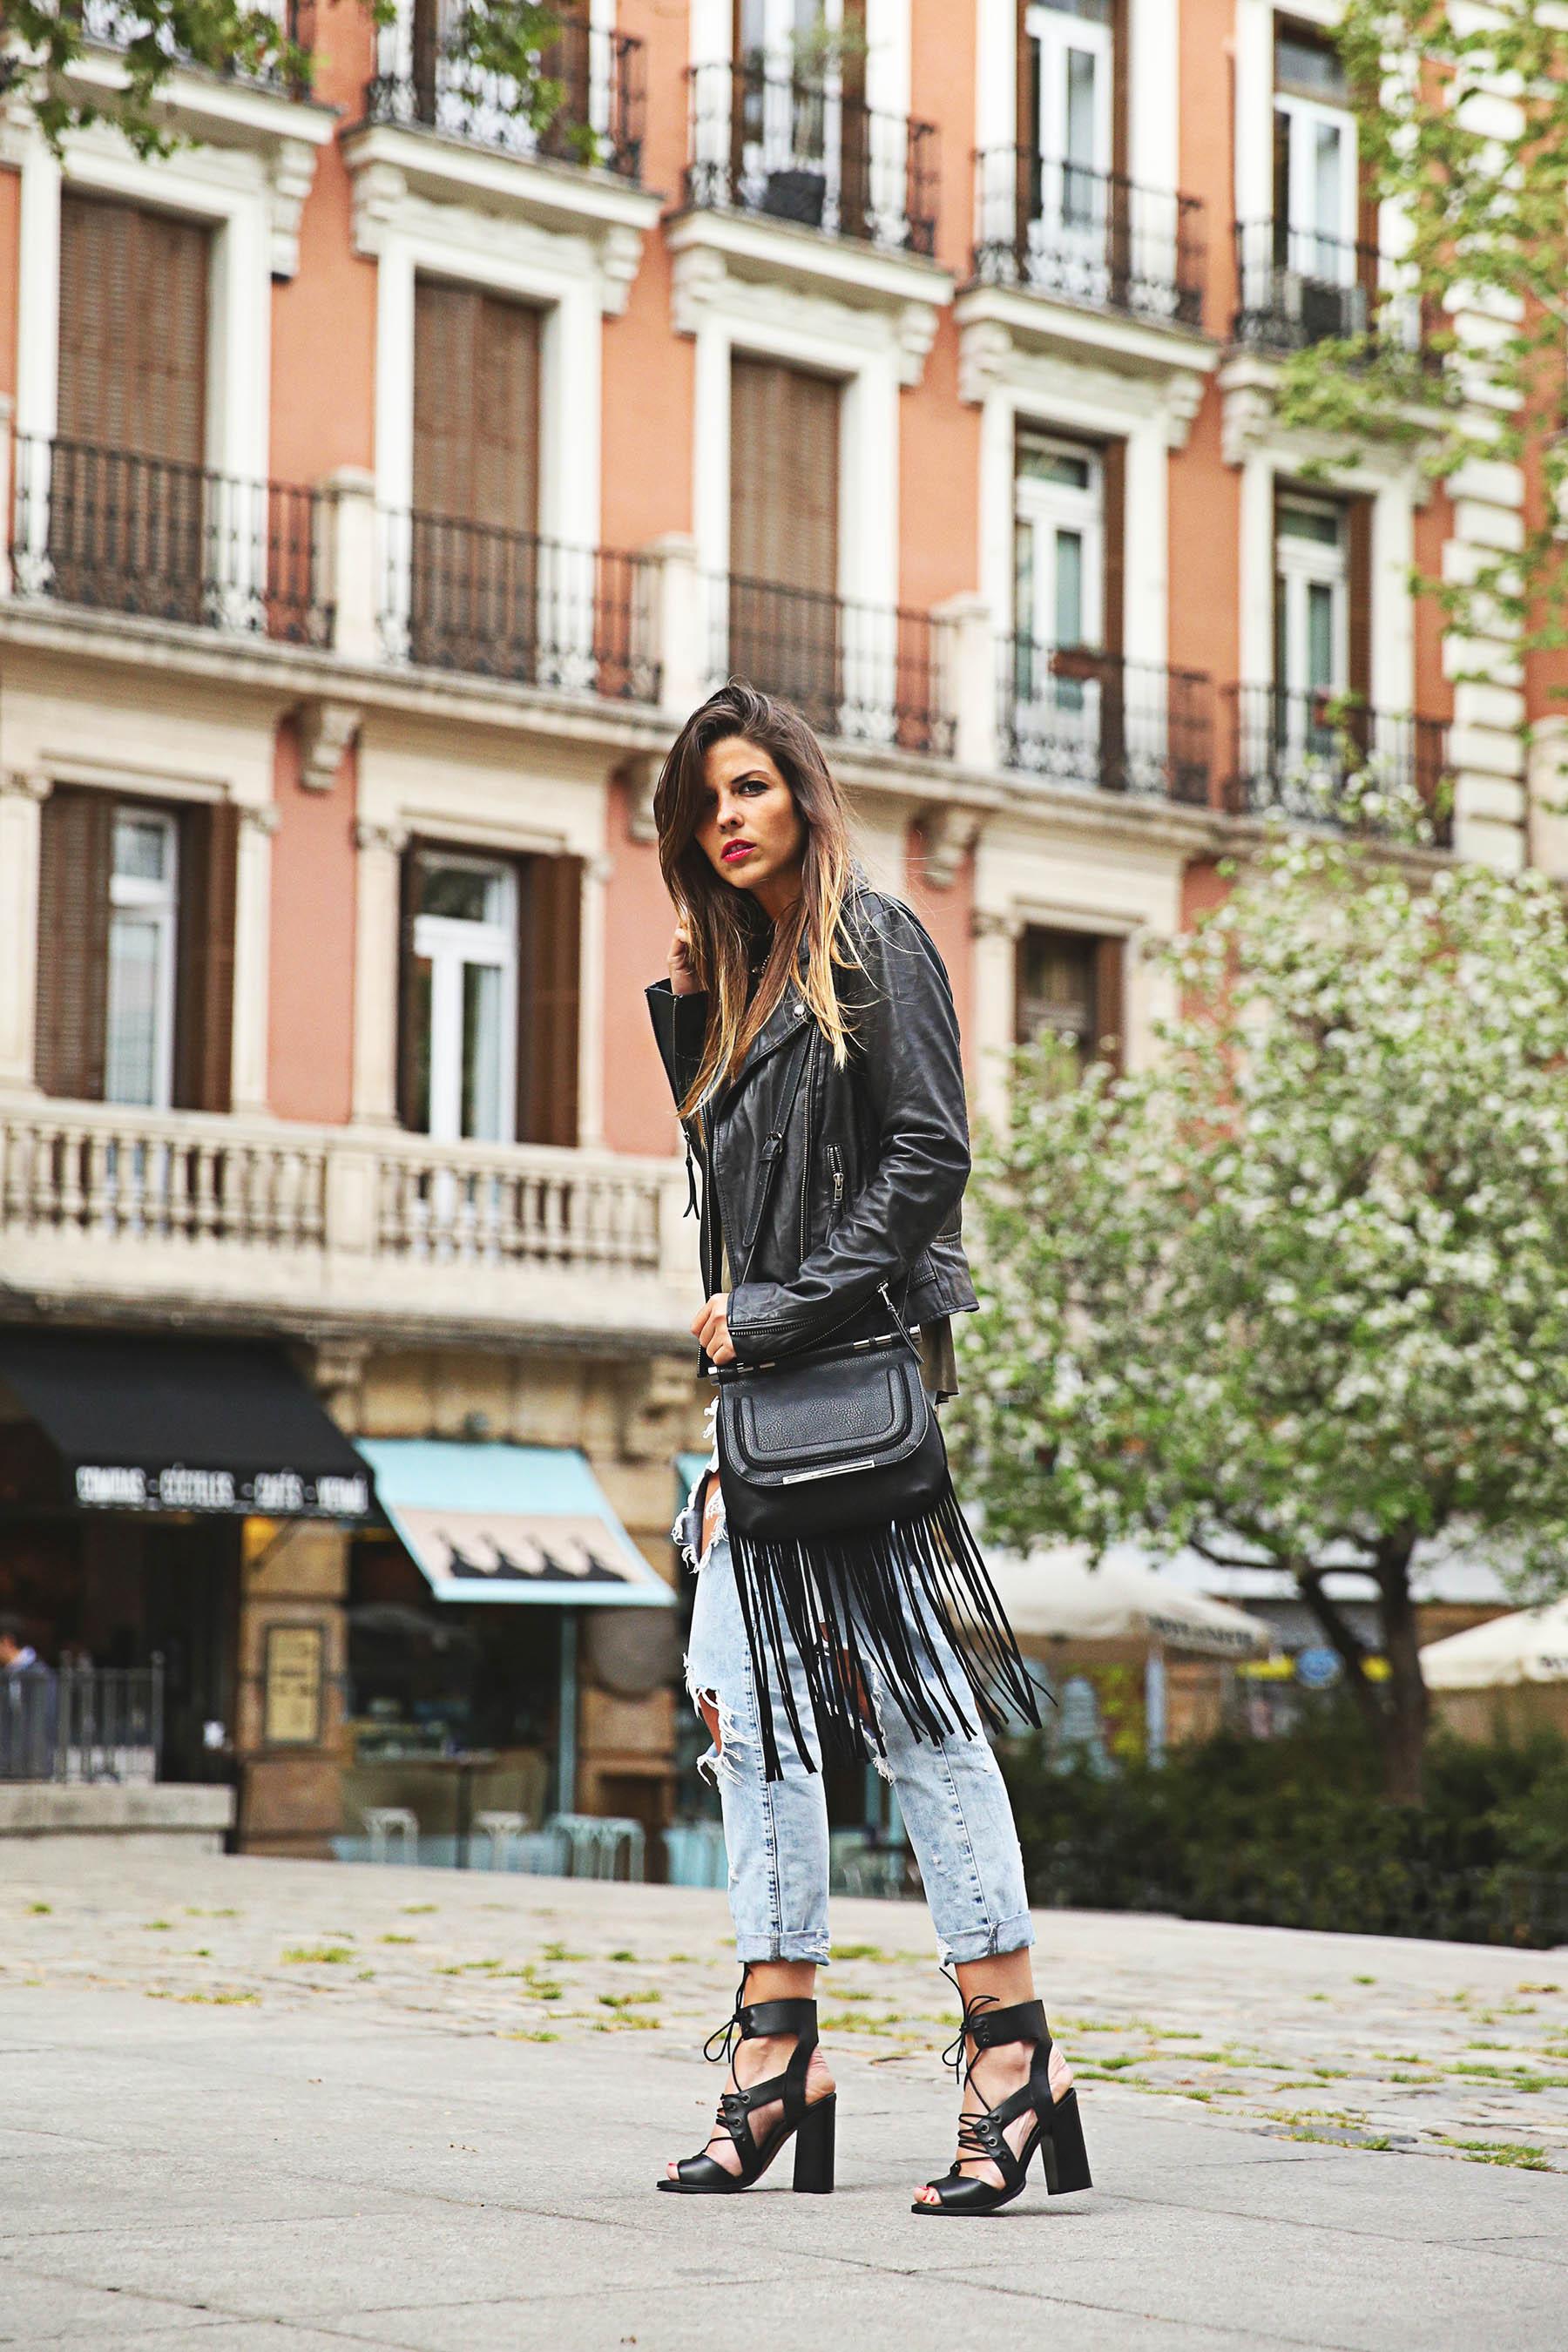 trendy-taste-look-outfit-street-style-ootd-blog-blogger-fashion-spain-moda-españa-boyfriend-vaqueros-jeans-steve-madden-sandalias-verano-primavera-leather-jacket-chaqueta-cuero-khaki-caqui-ripped-rotos-2